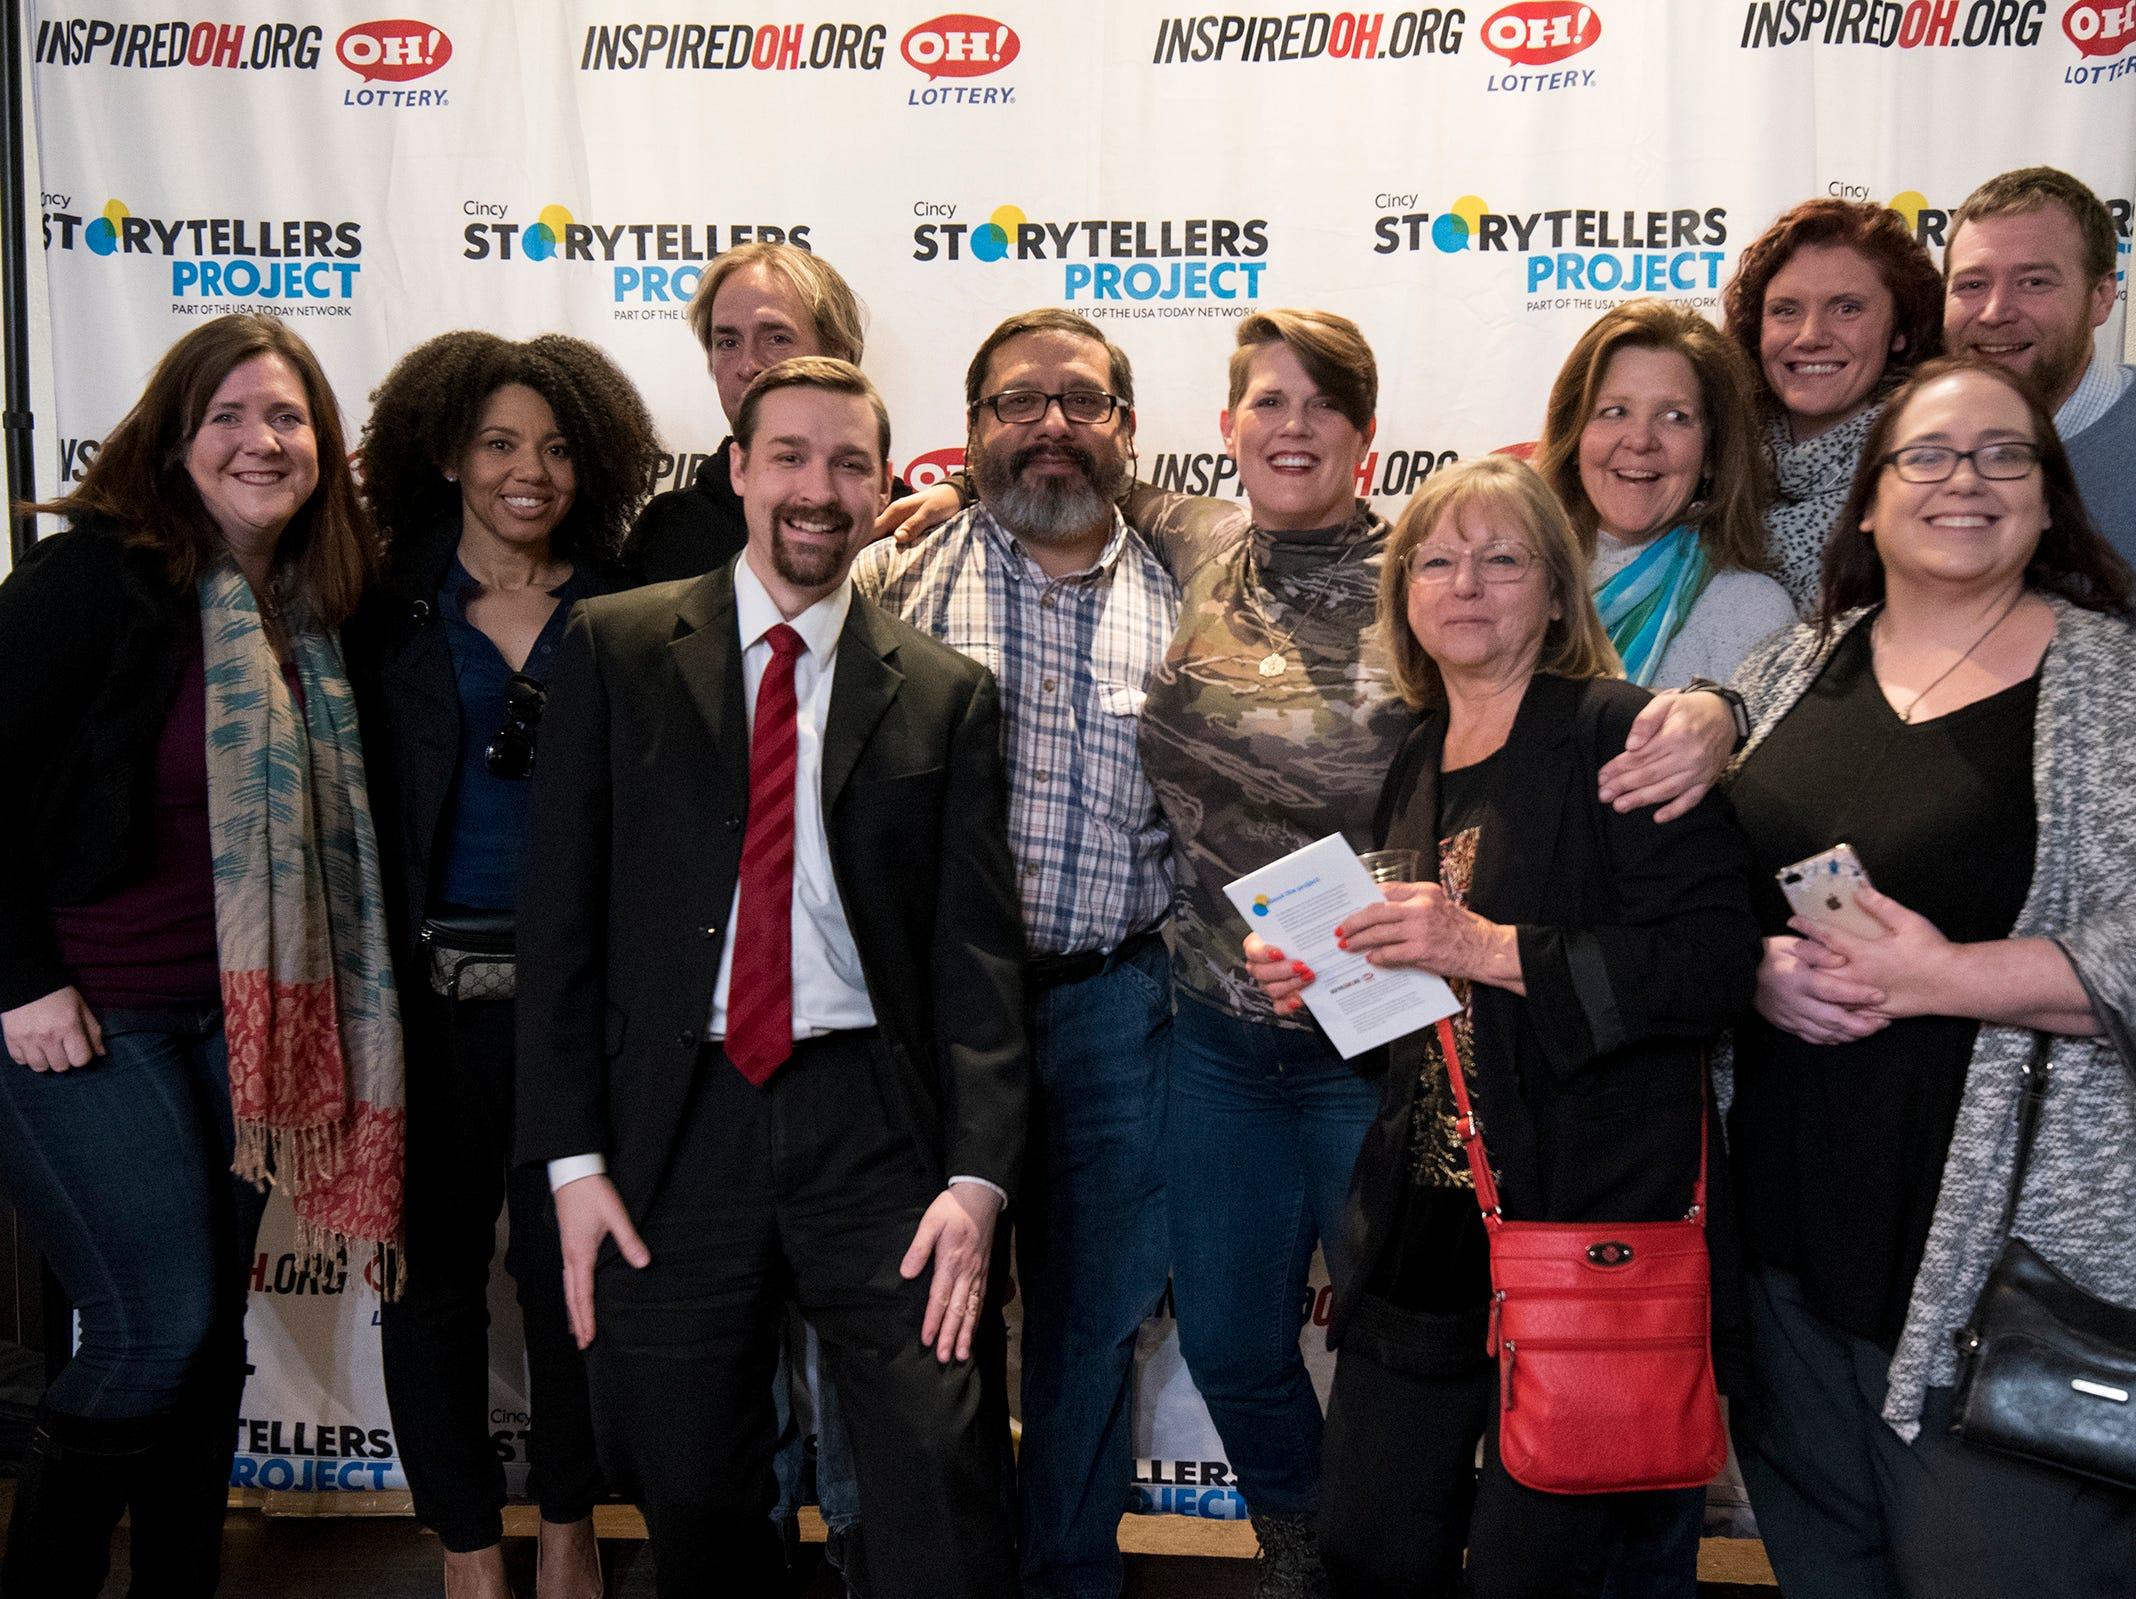 Cincinnati Storytellers Project: Five tales of romance